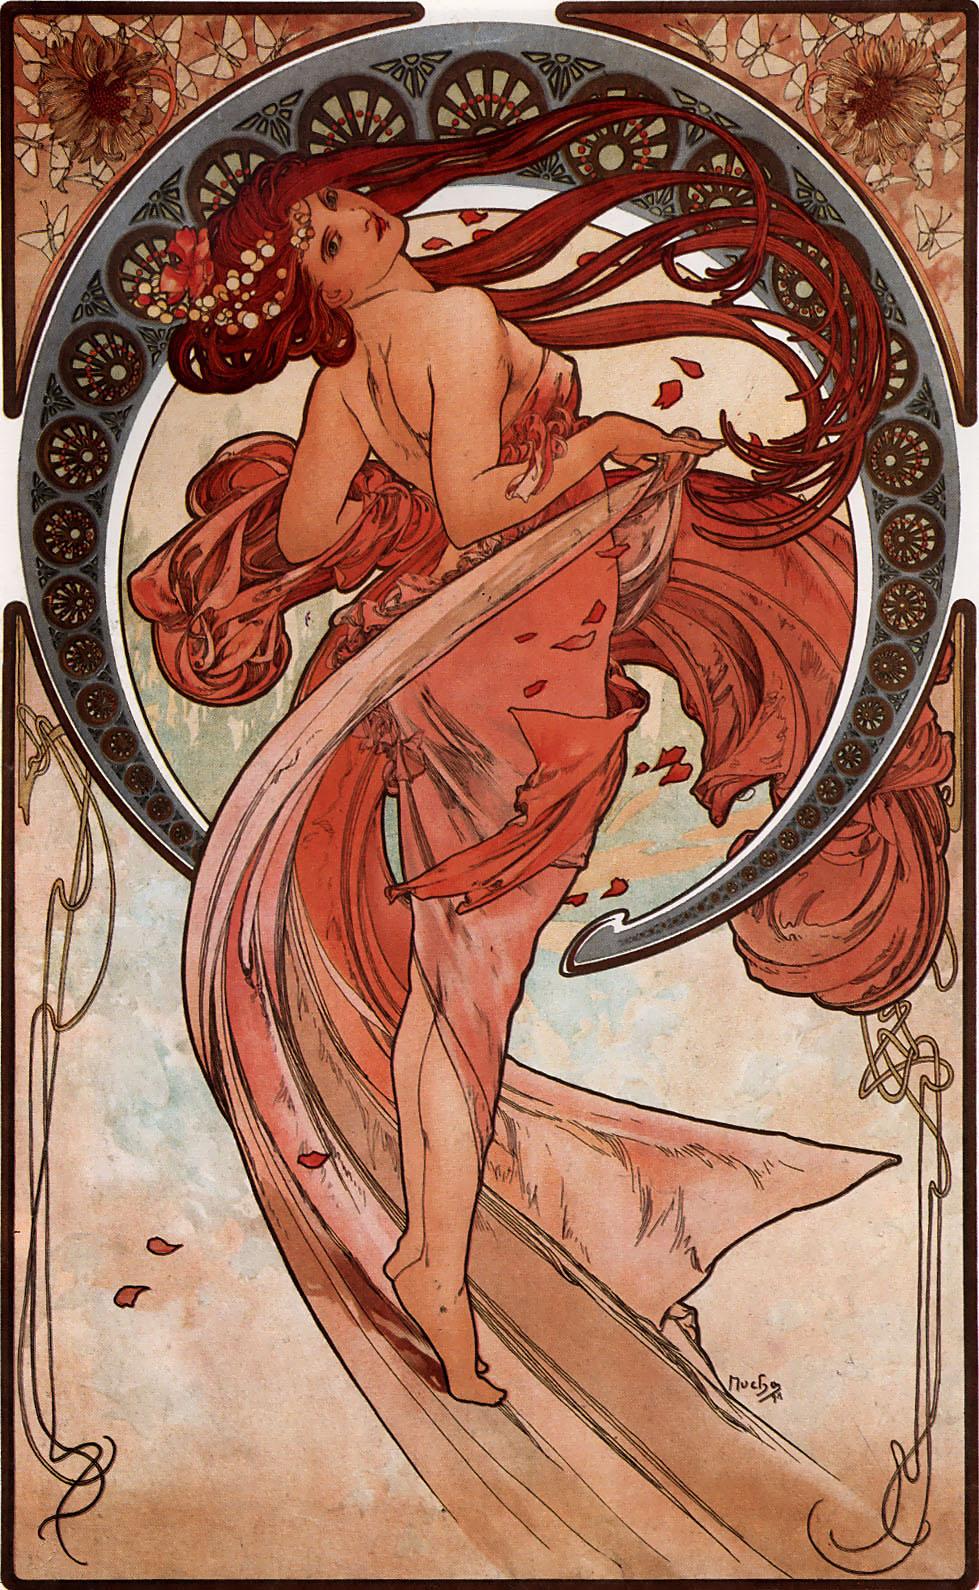 http://upload.wikimedia.org/wikipedia/commons/2/26/Alfons_Mucha_-_1898_-_Dance.jpg